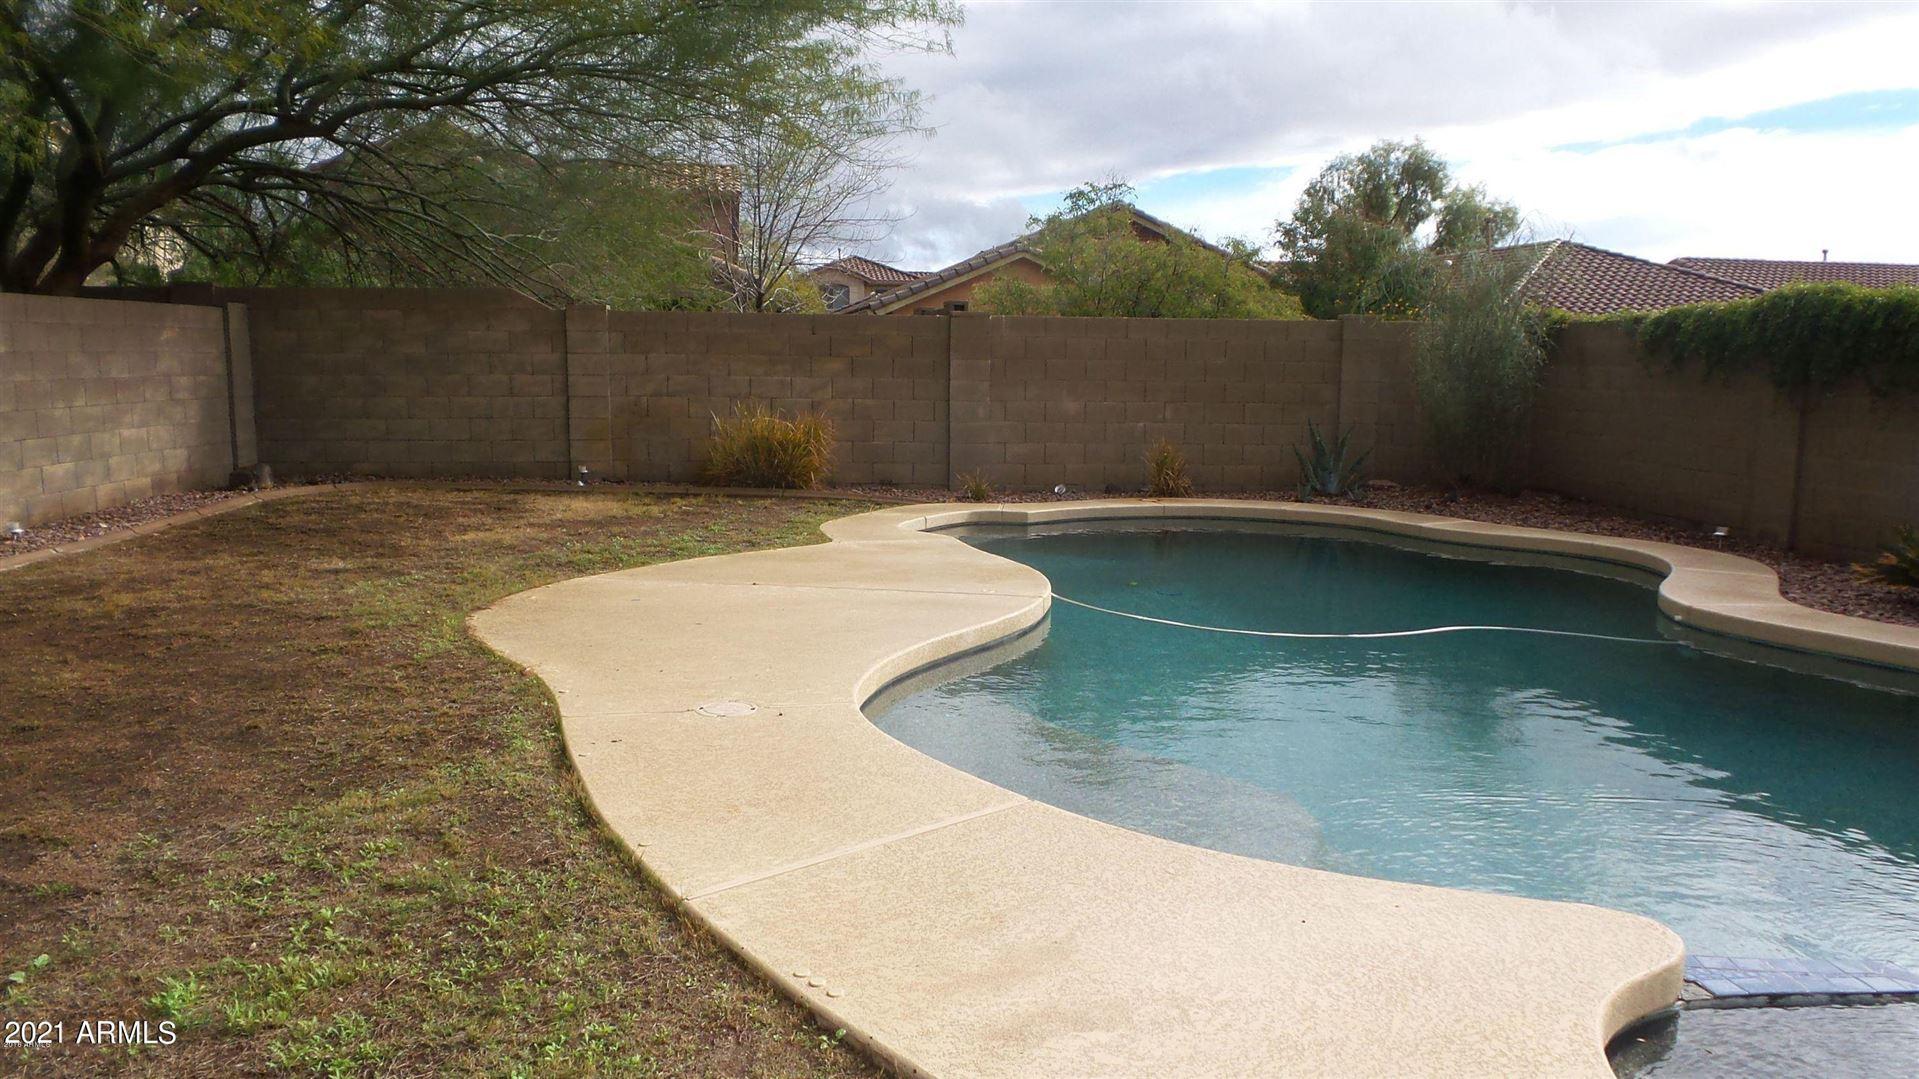 Photo of 39829 N RIVER BEND Road, Phoenix, AZ 85086 (MLS # 6201255)